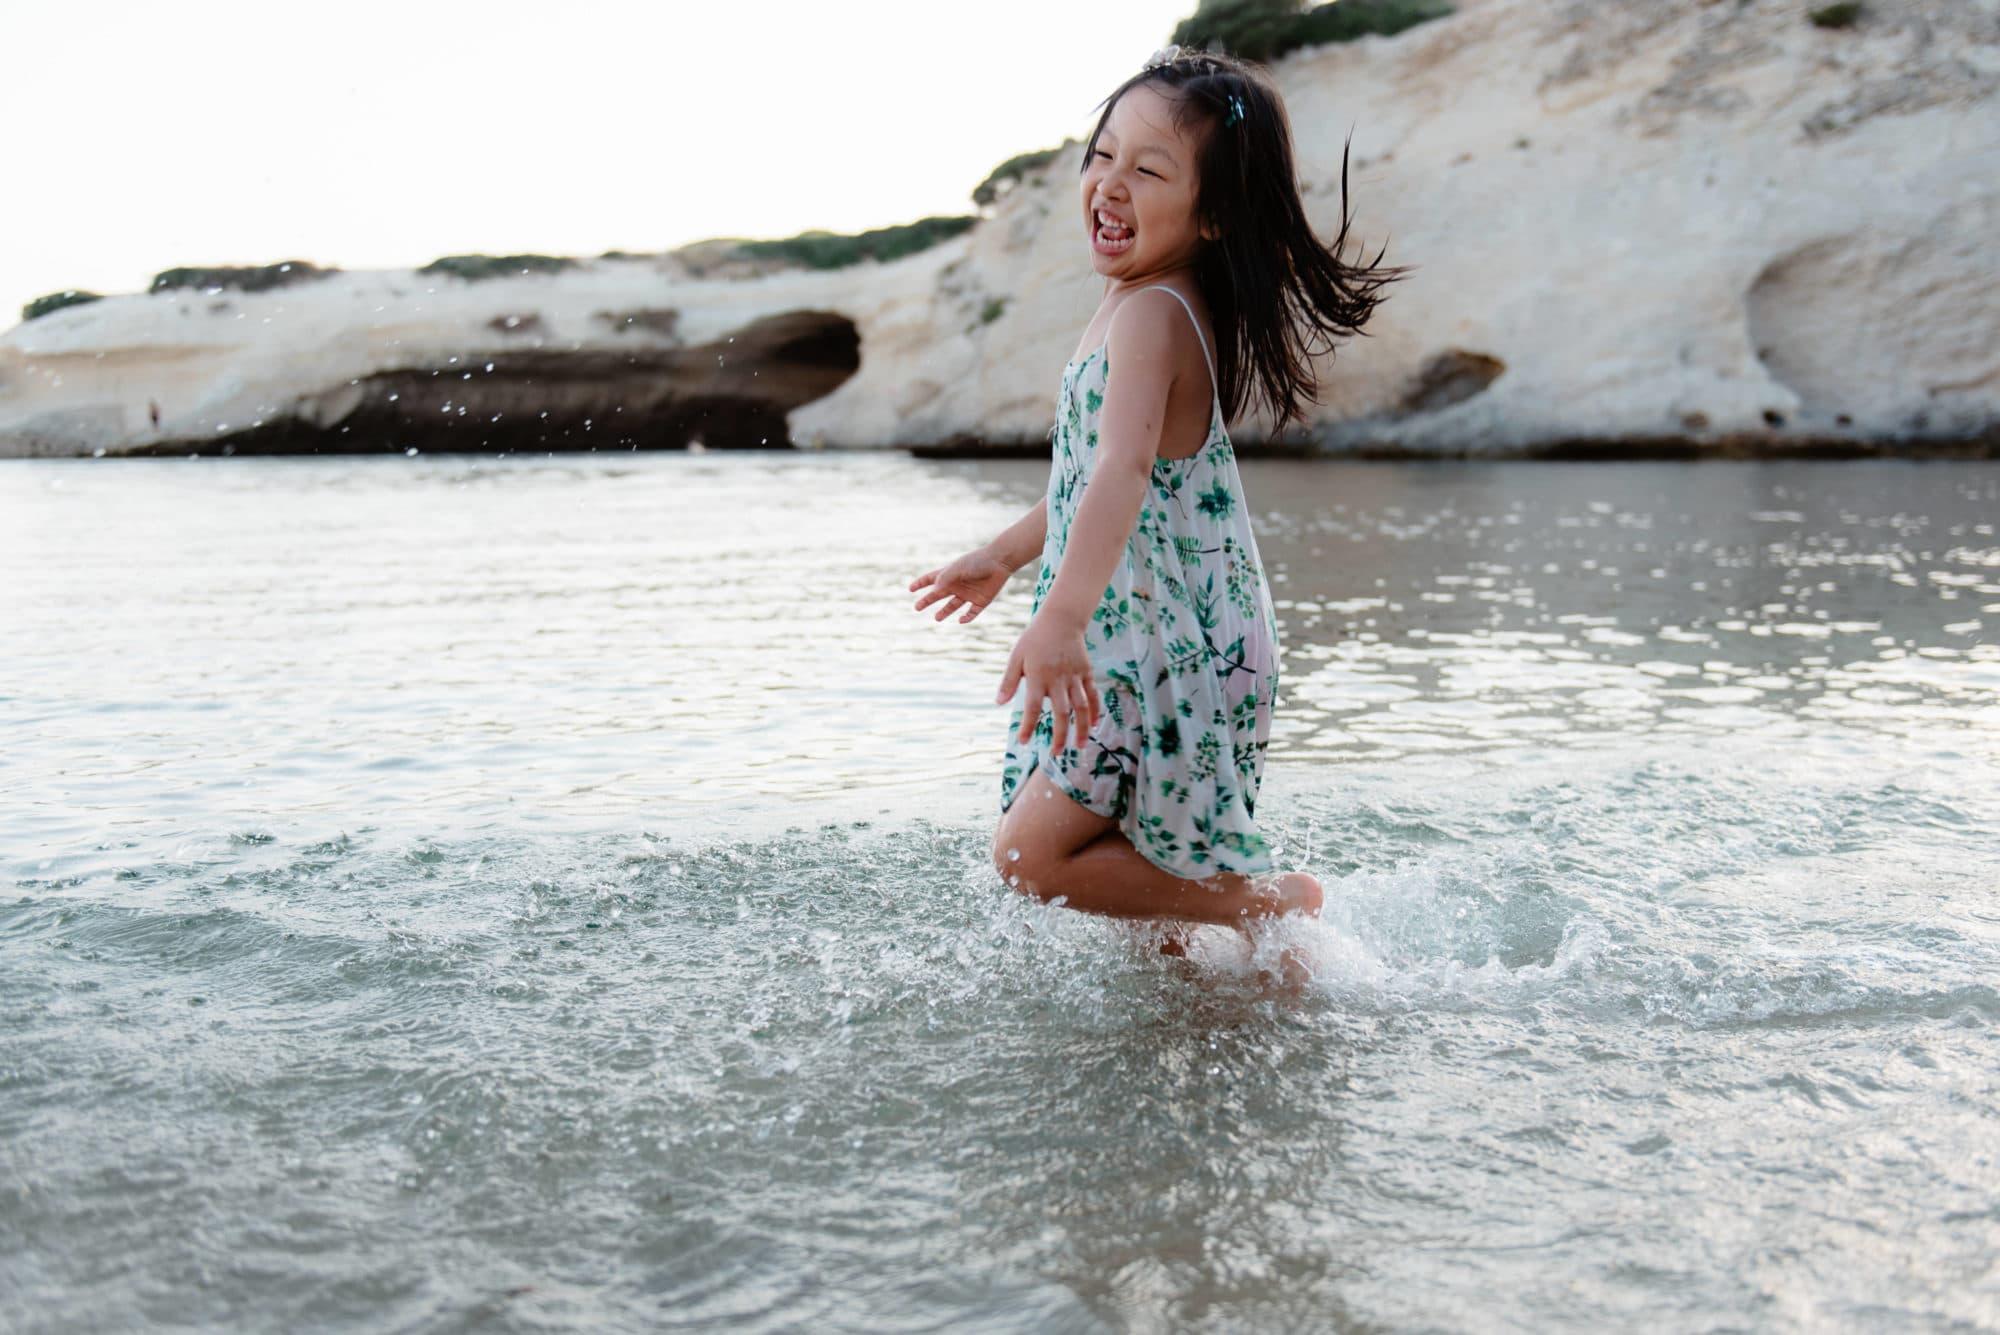 Sardinia Photographer reviews valeria mameli